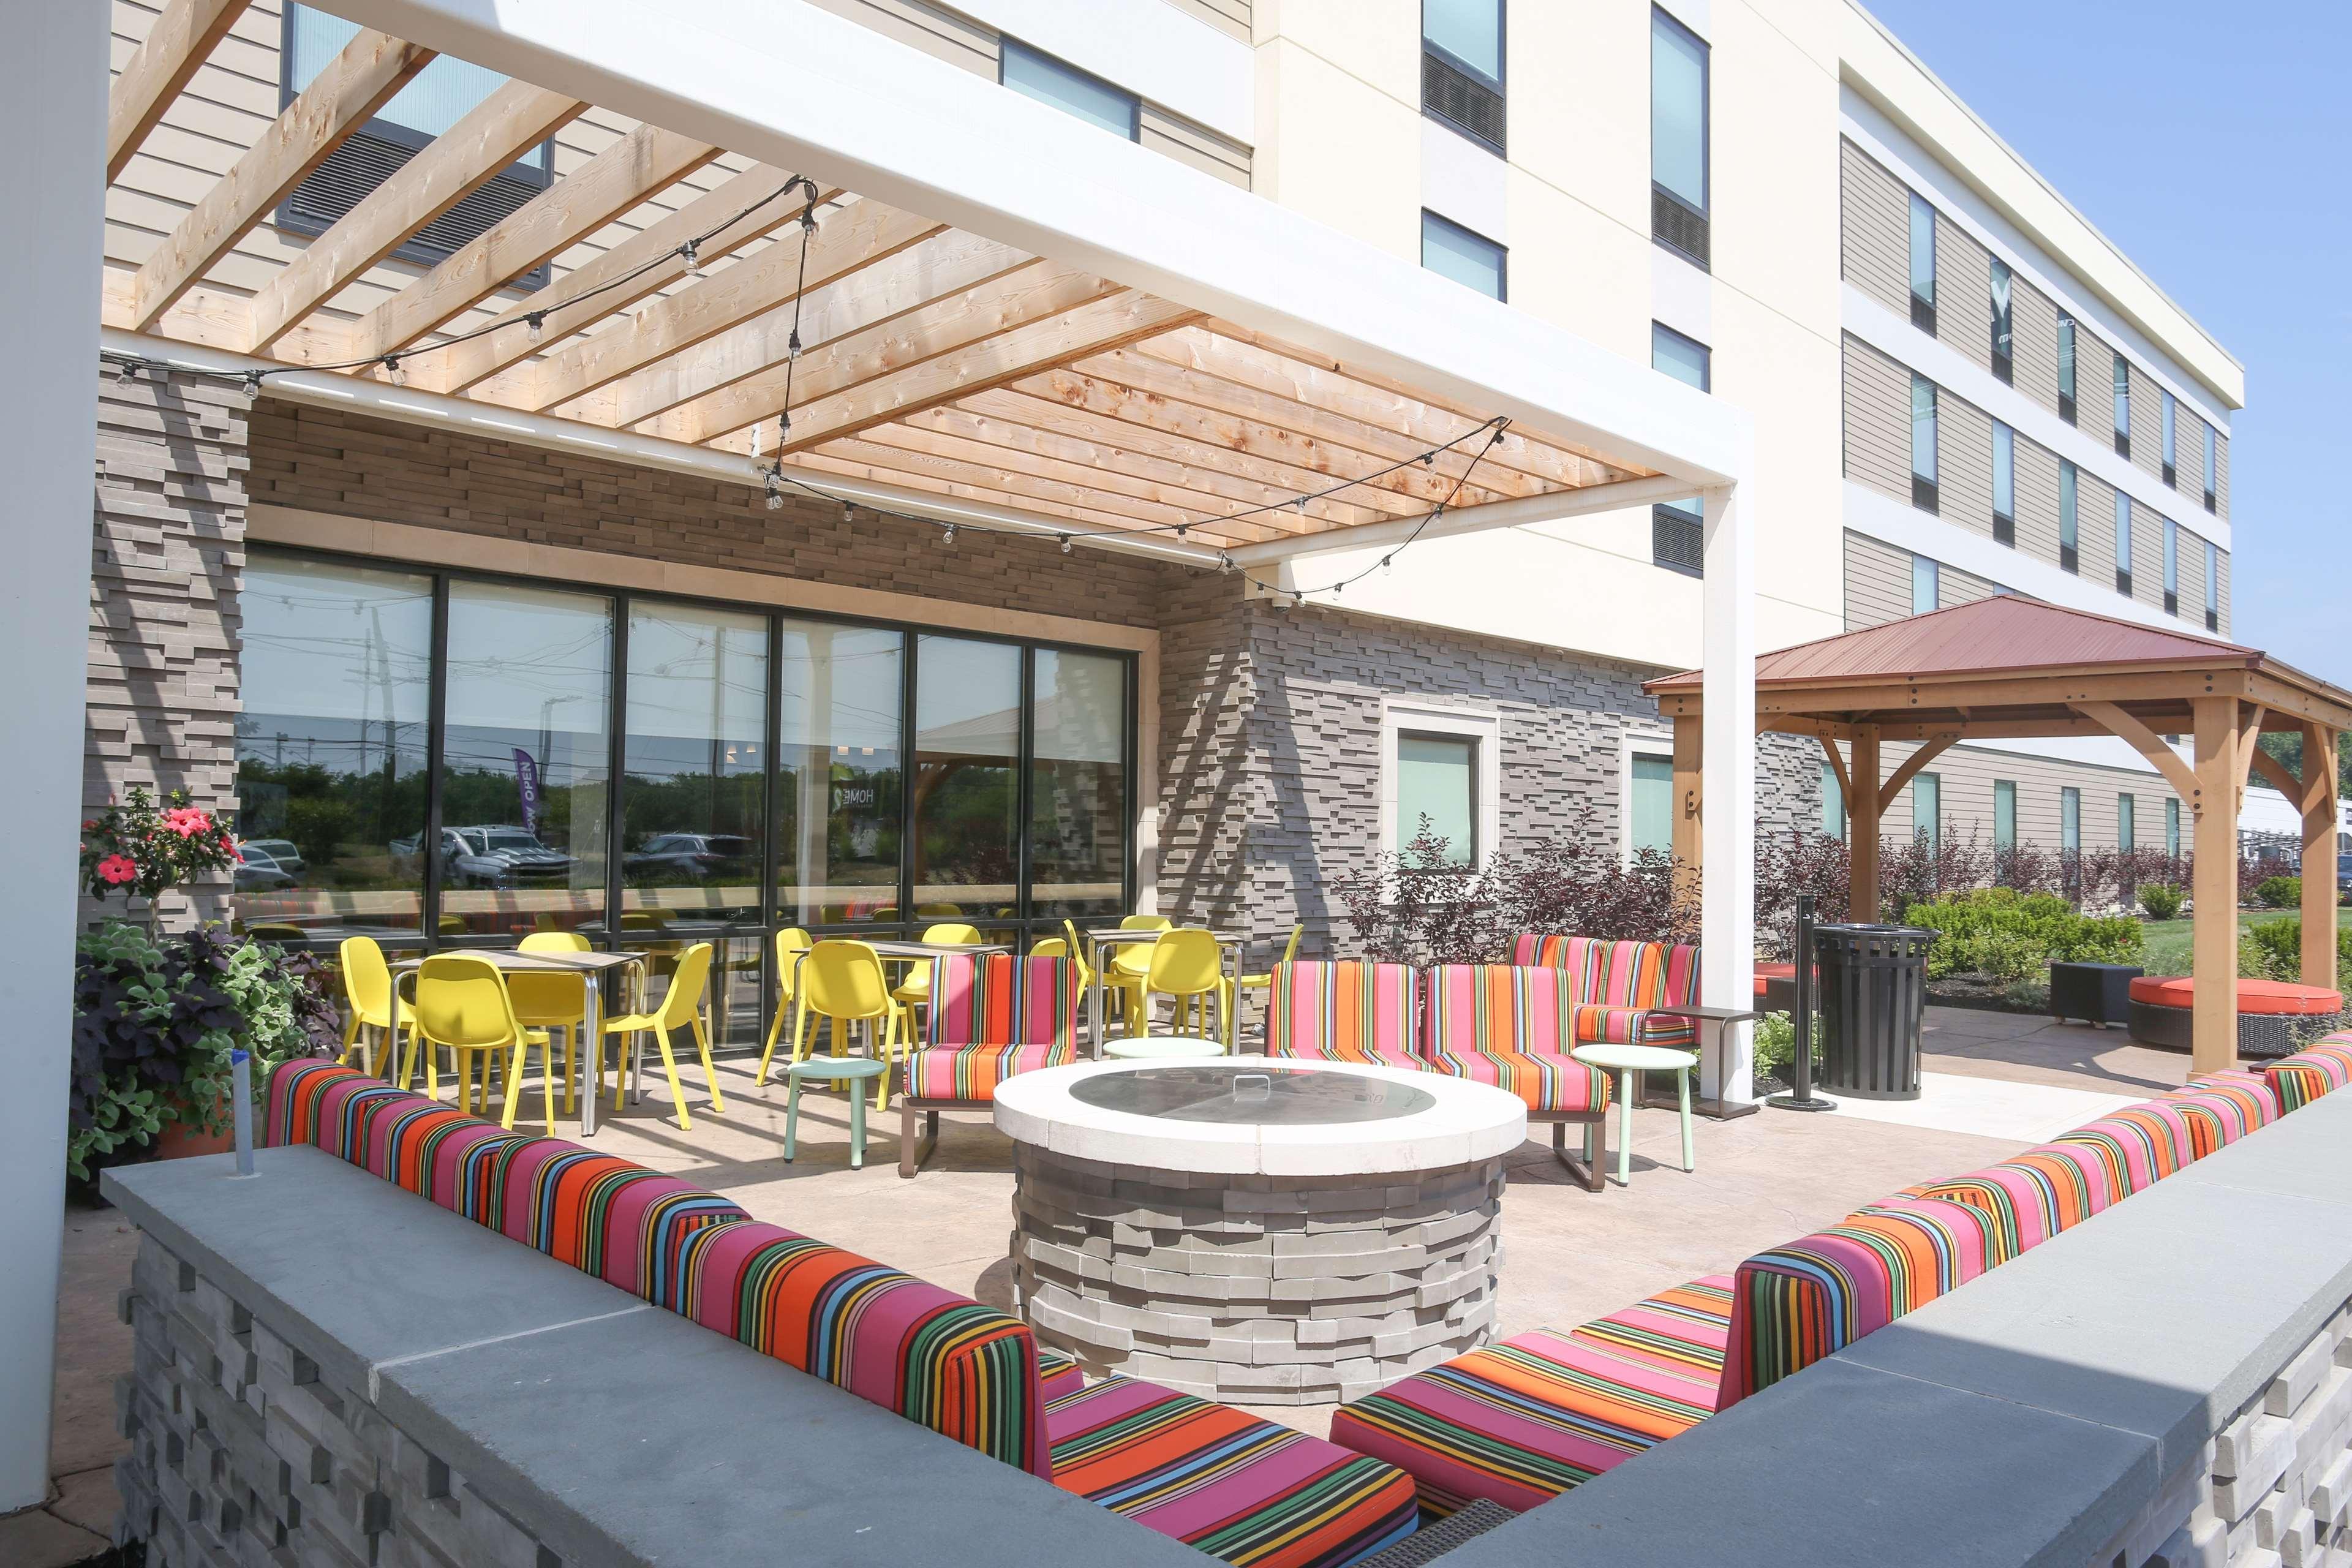 Home2 Suites by Hilton Bordentown image 7